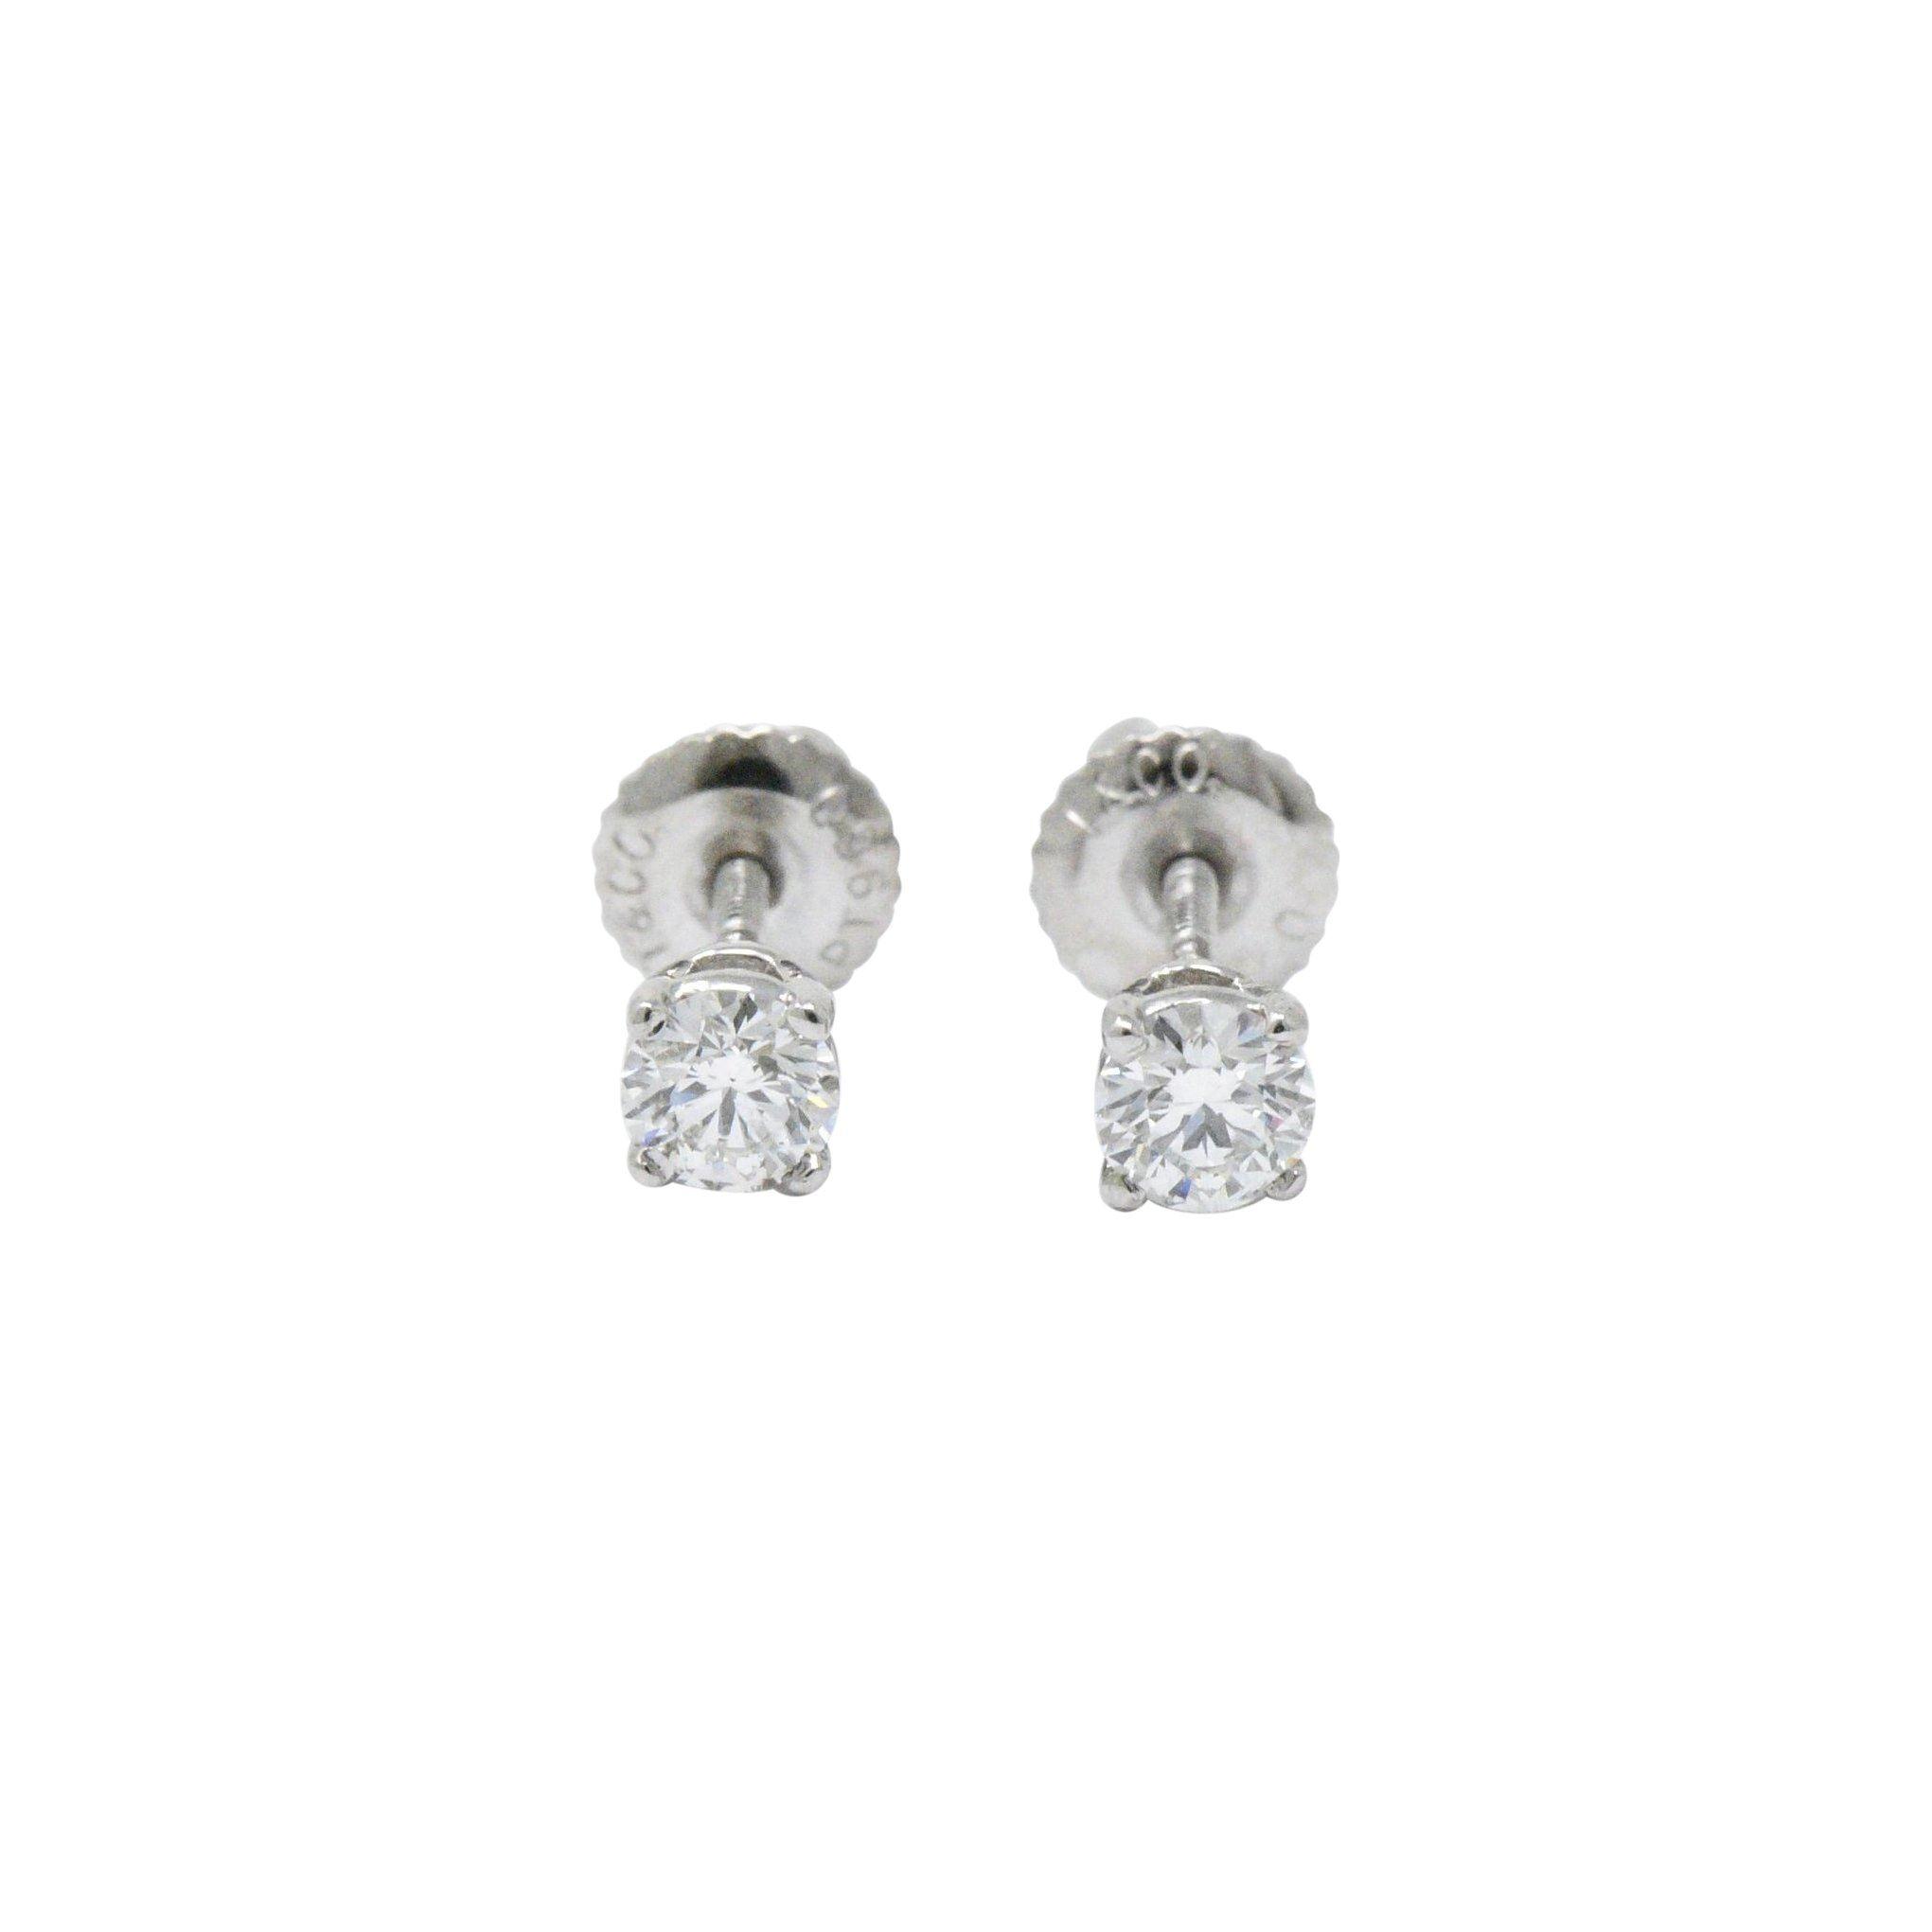 2611f3642 Tiffany and Co. .48 Carat Diamond Platinum Studs Earrings at 1stdibs